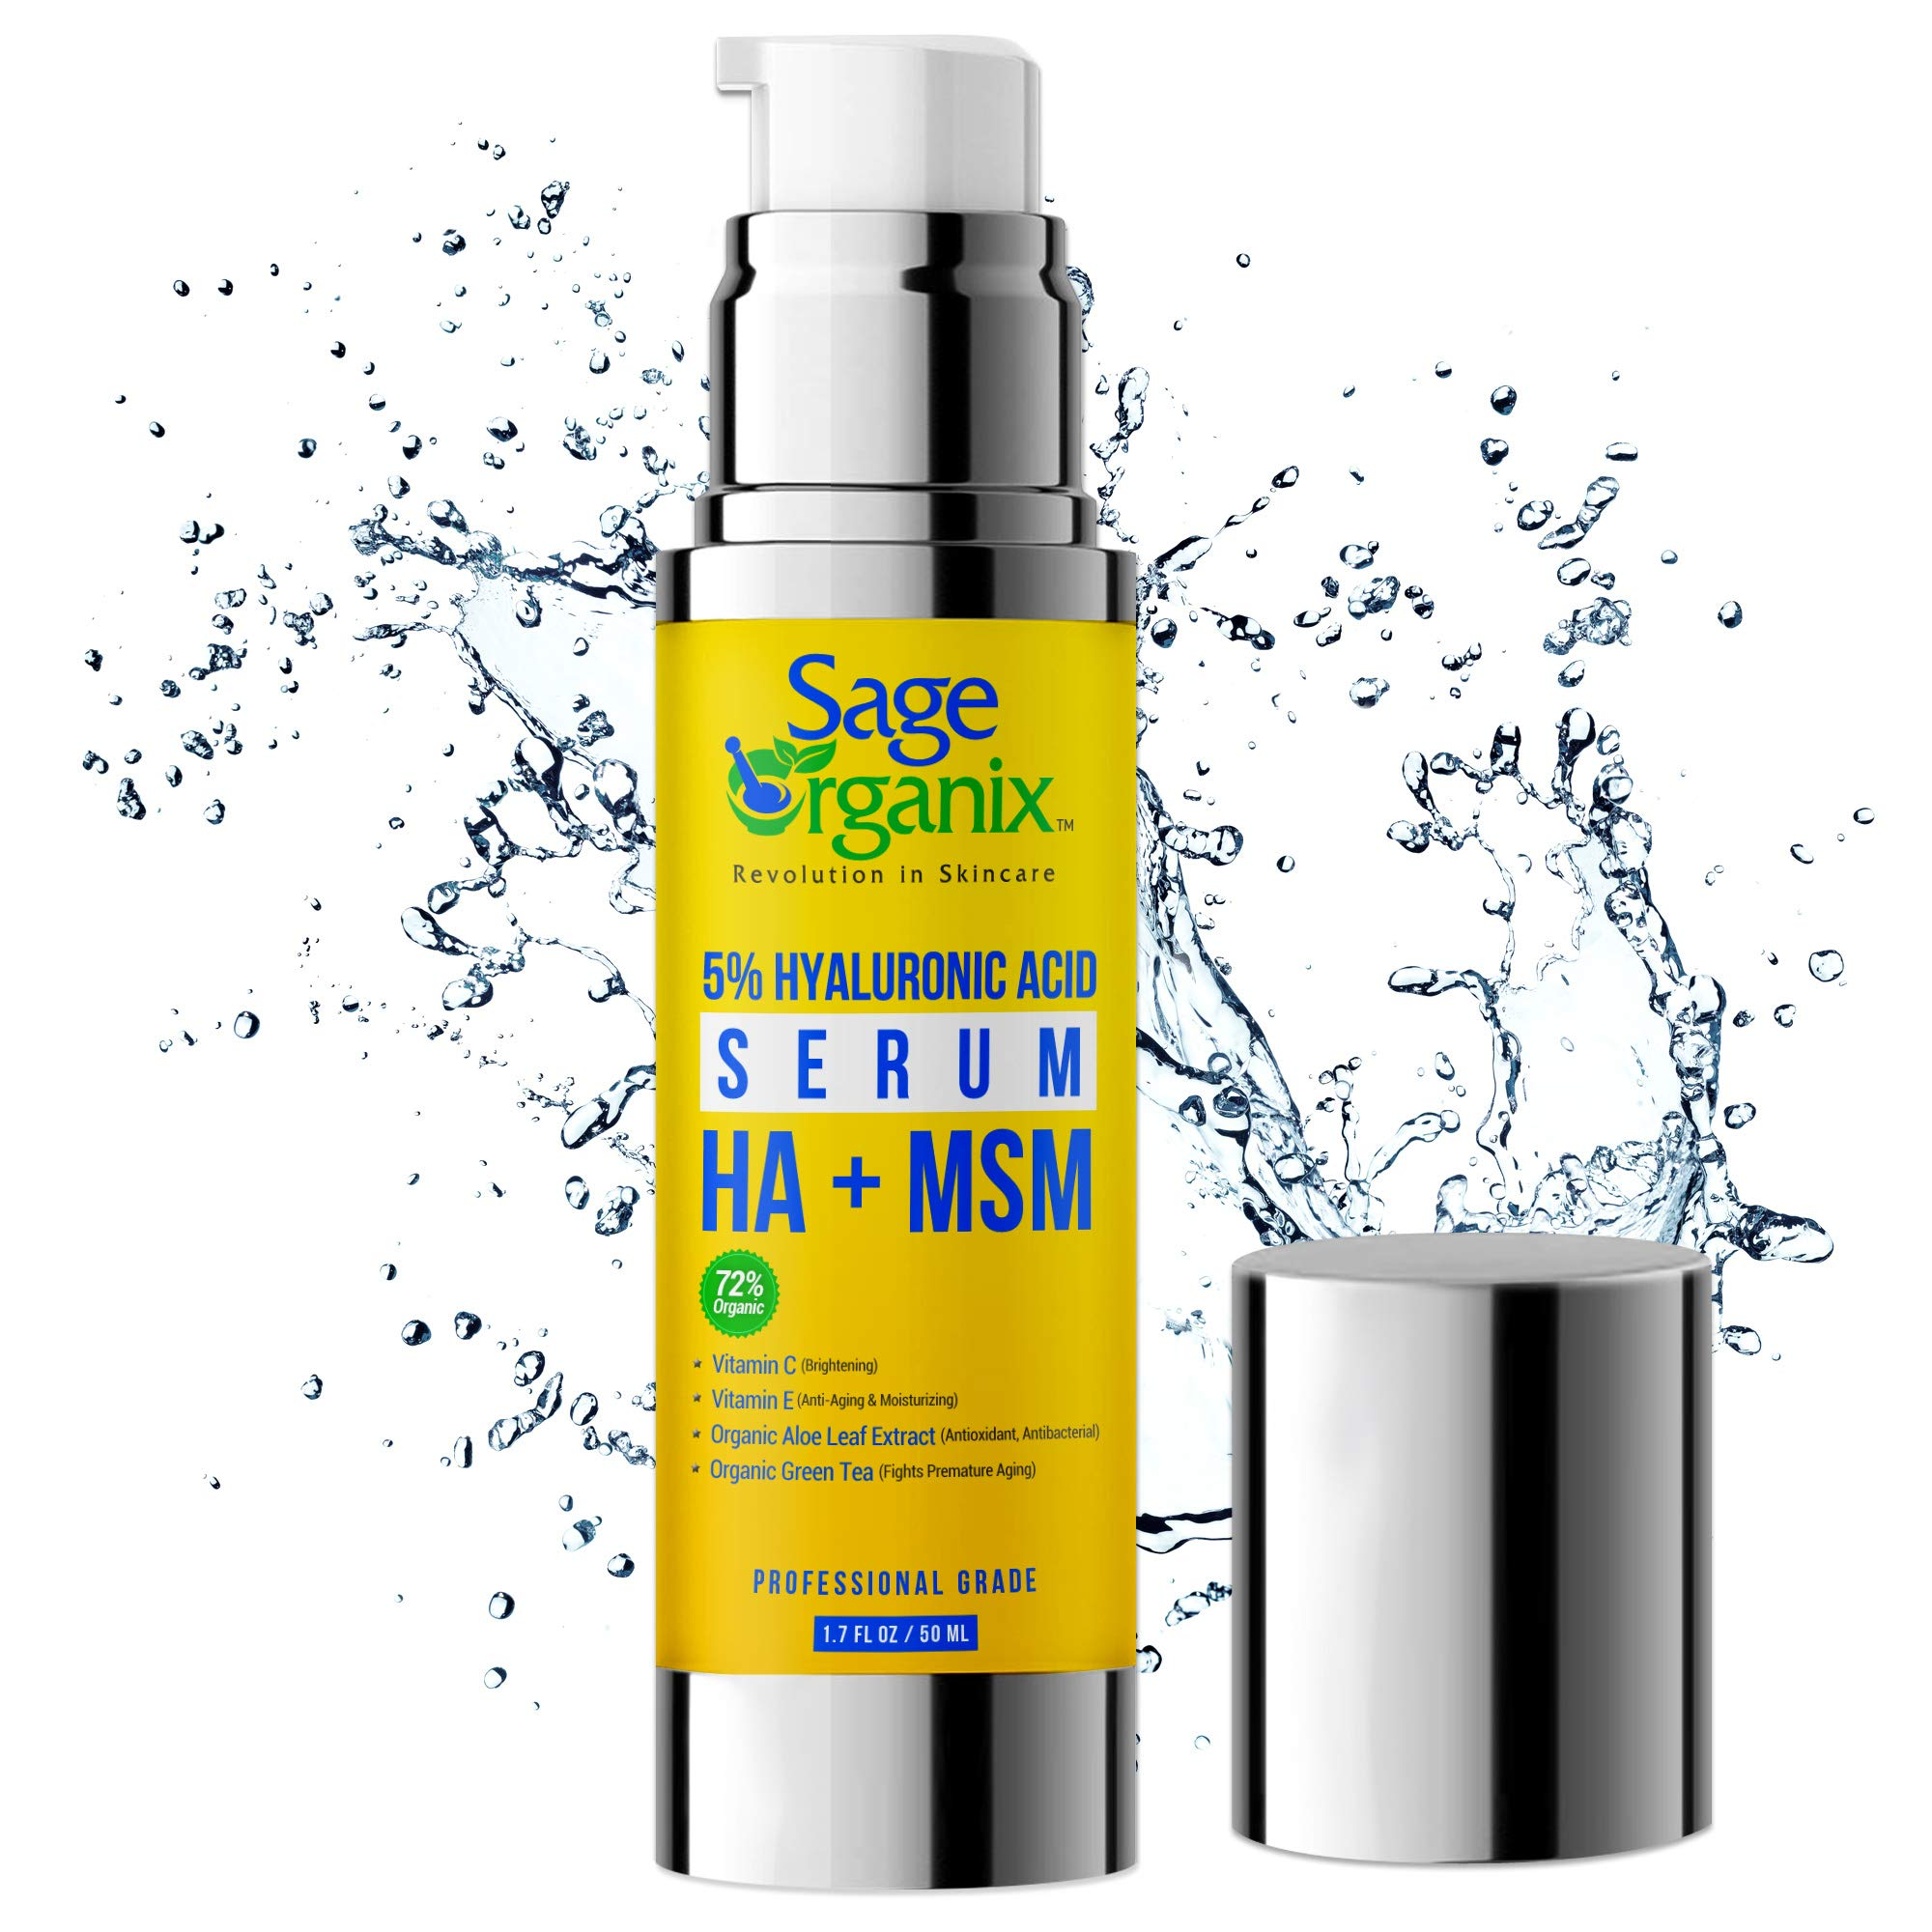 Sage Organix 5% HYALURONIC ACID VITAMIN C FACIAL SERUM, 72% ORGANIC Collagen Boosting, Brightening, Firming, Plumping Skin Serum to Slow Premature Aging Wrinkles & Fine Lines, Witch Hazel, MSM 1.7 oz